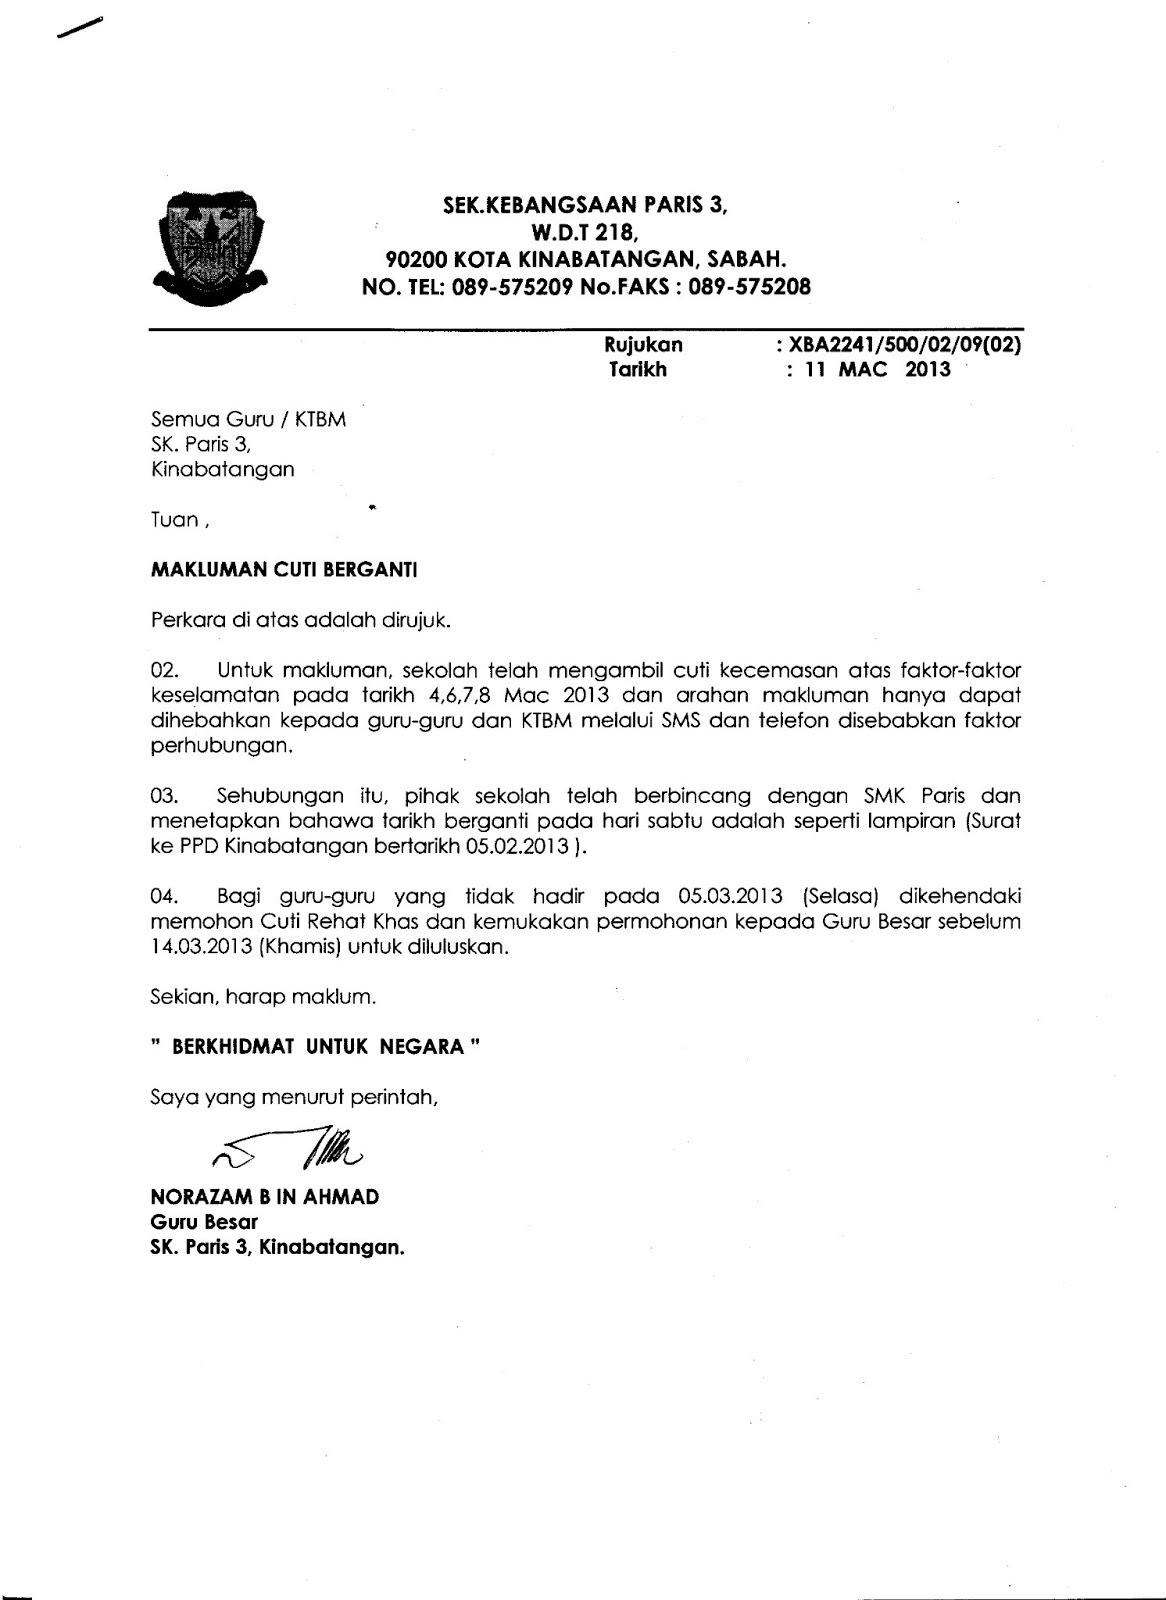 Contoh Surat Cuti Security